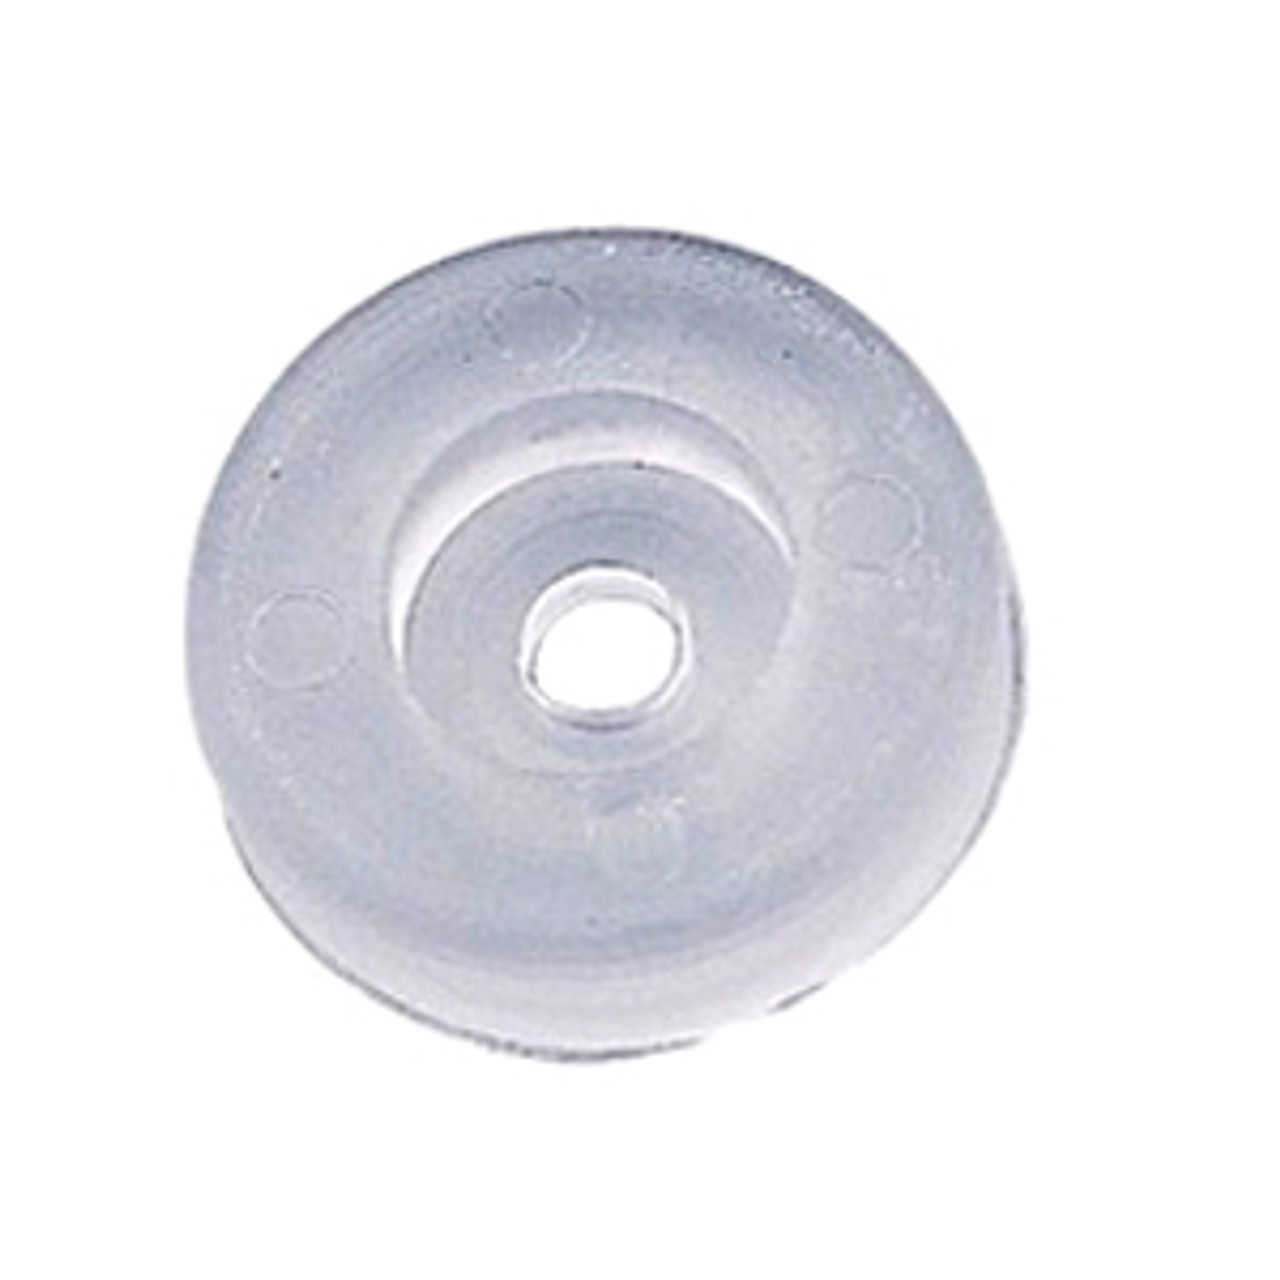 Sea-Dog 324391-1 Windshield//Door Bumper Pad Clear